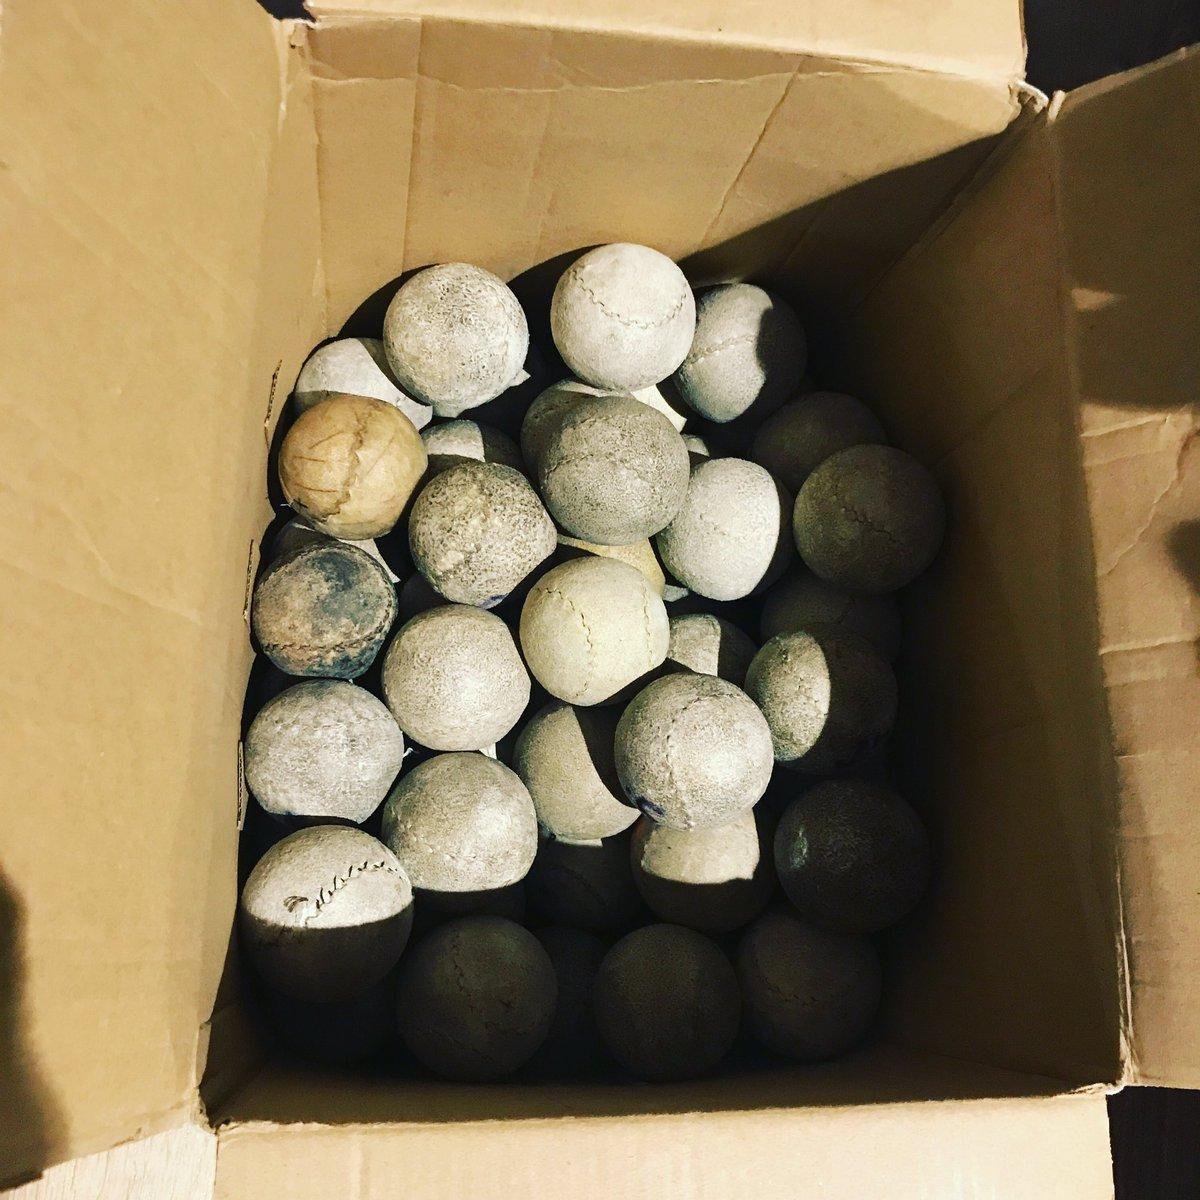 Manoseando pelotas usadas de pelotaris en @PelotariProject #gustirrinín